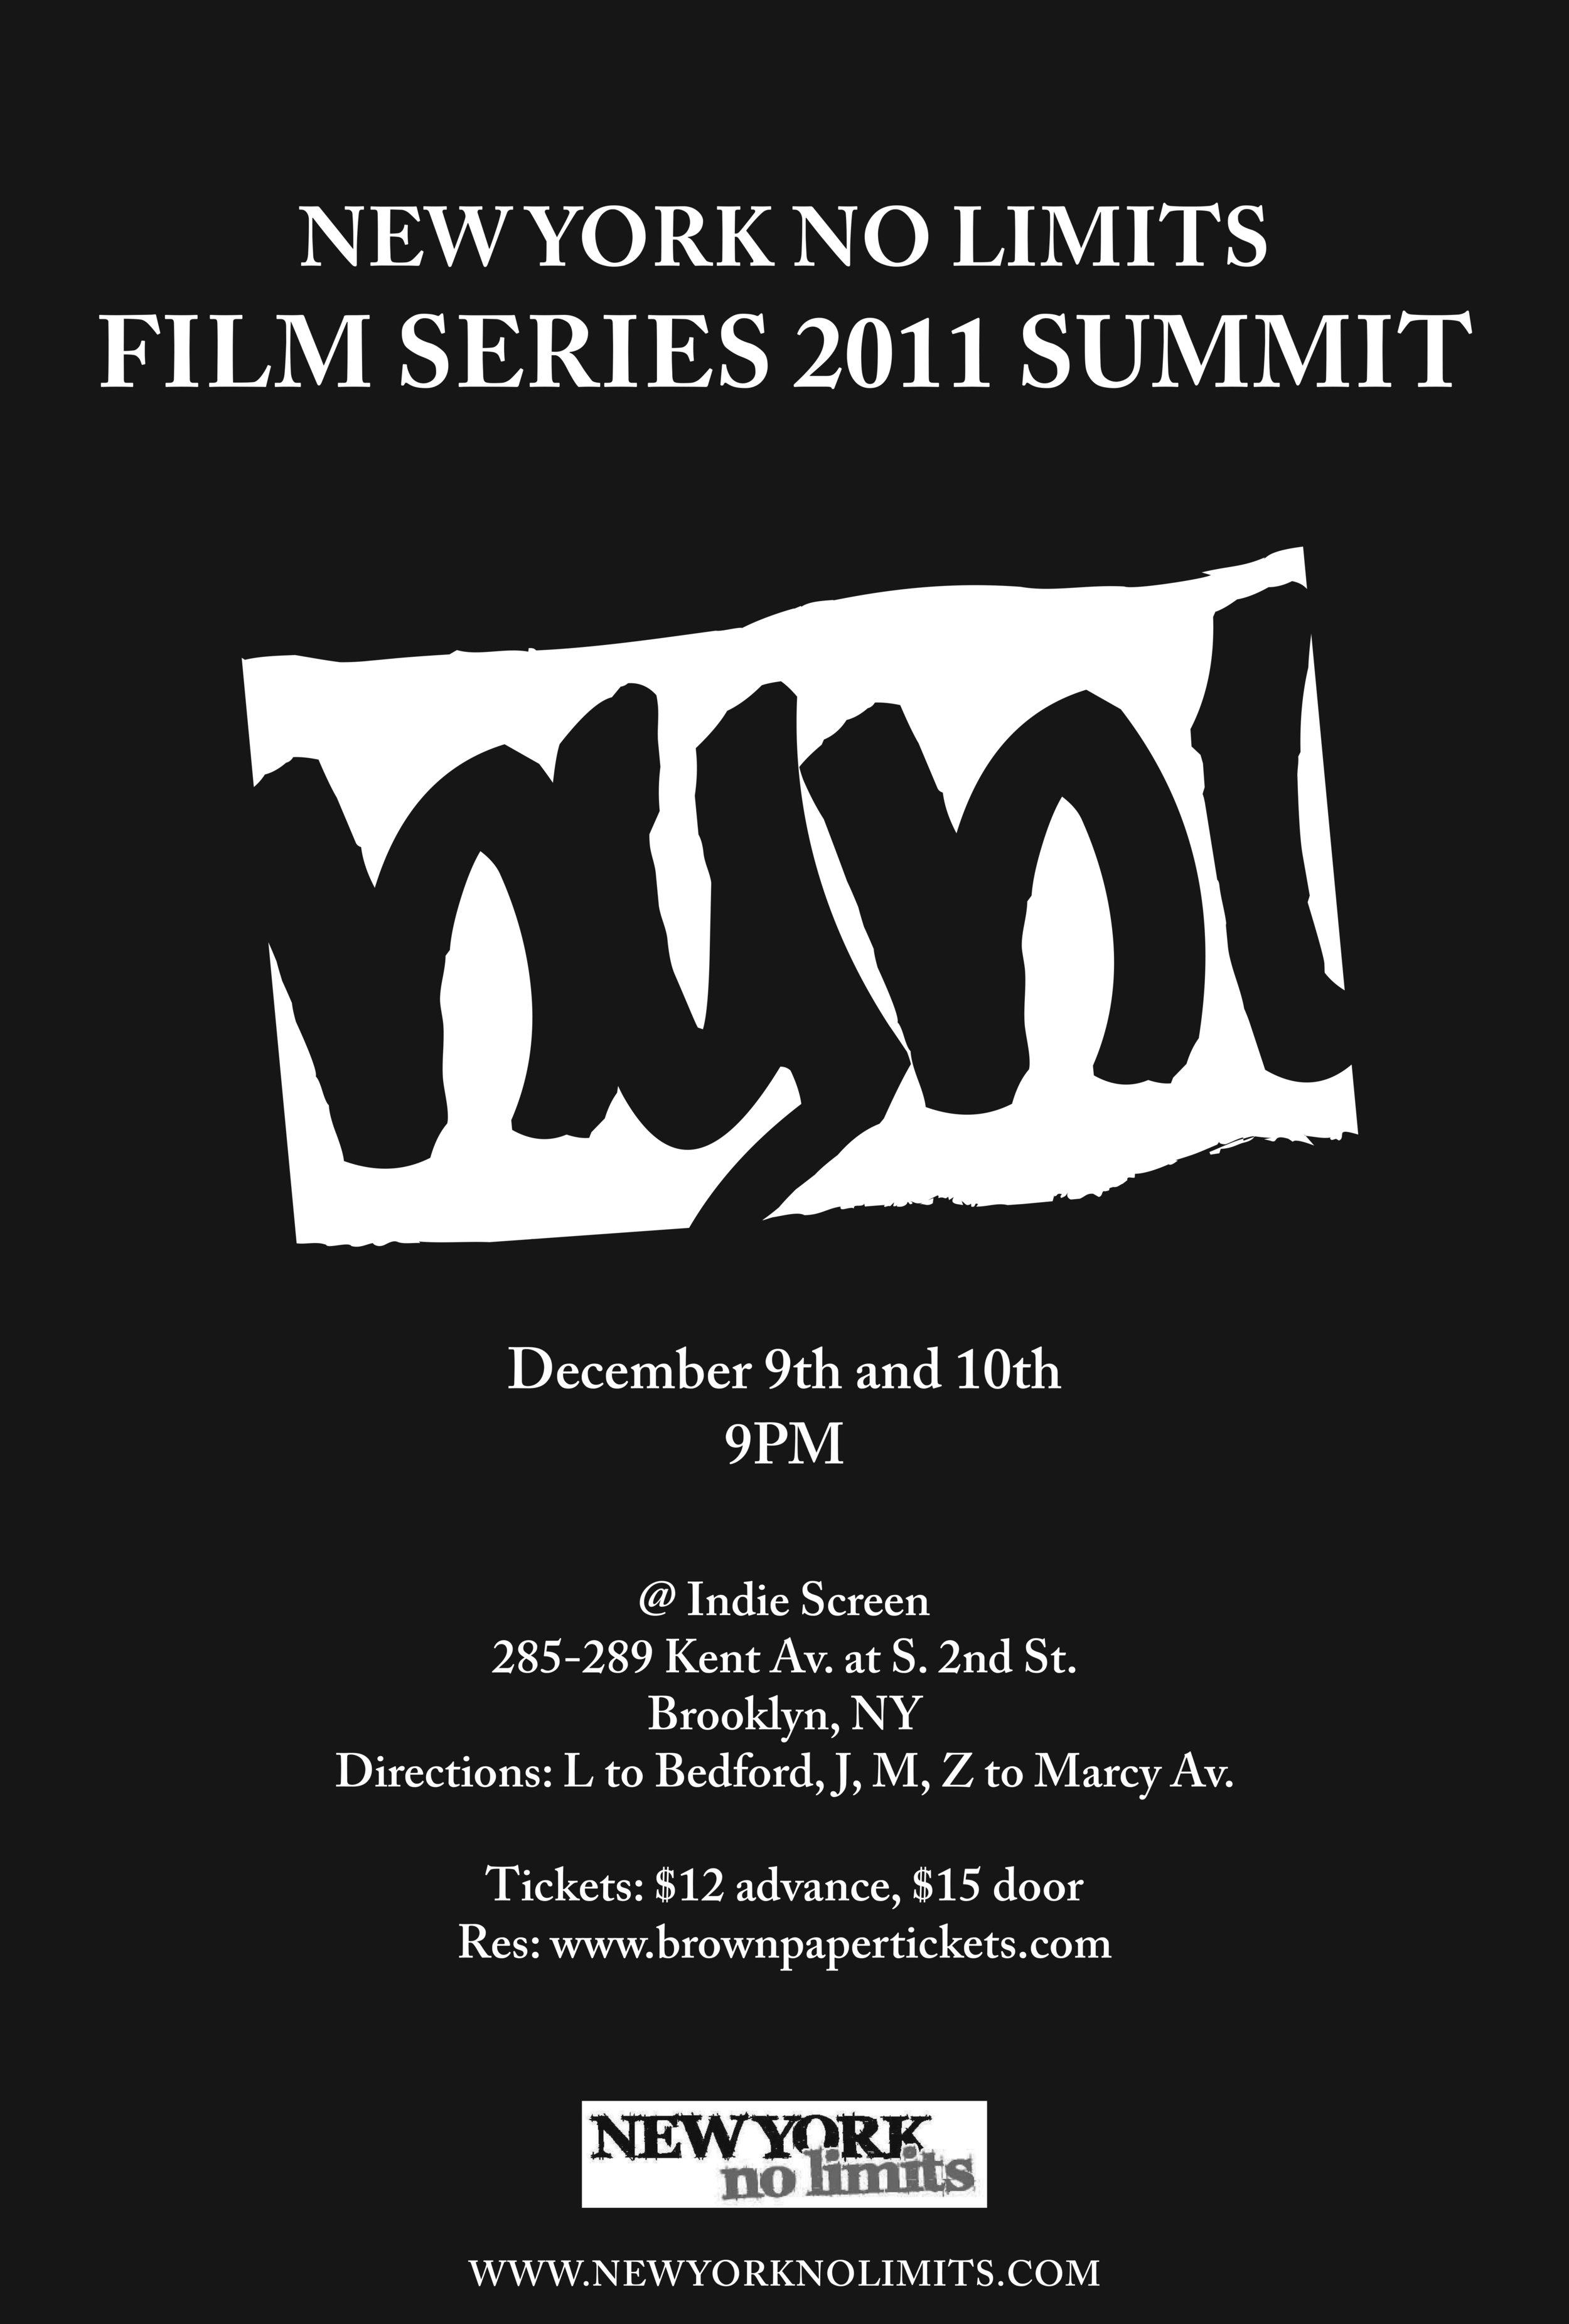 2011 NYNL Poster 27x40.jpg